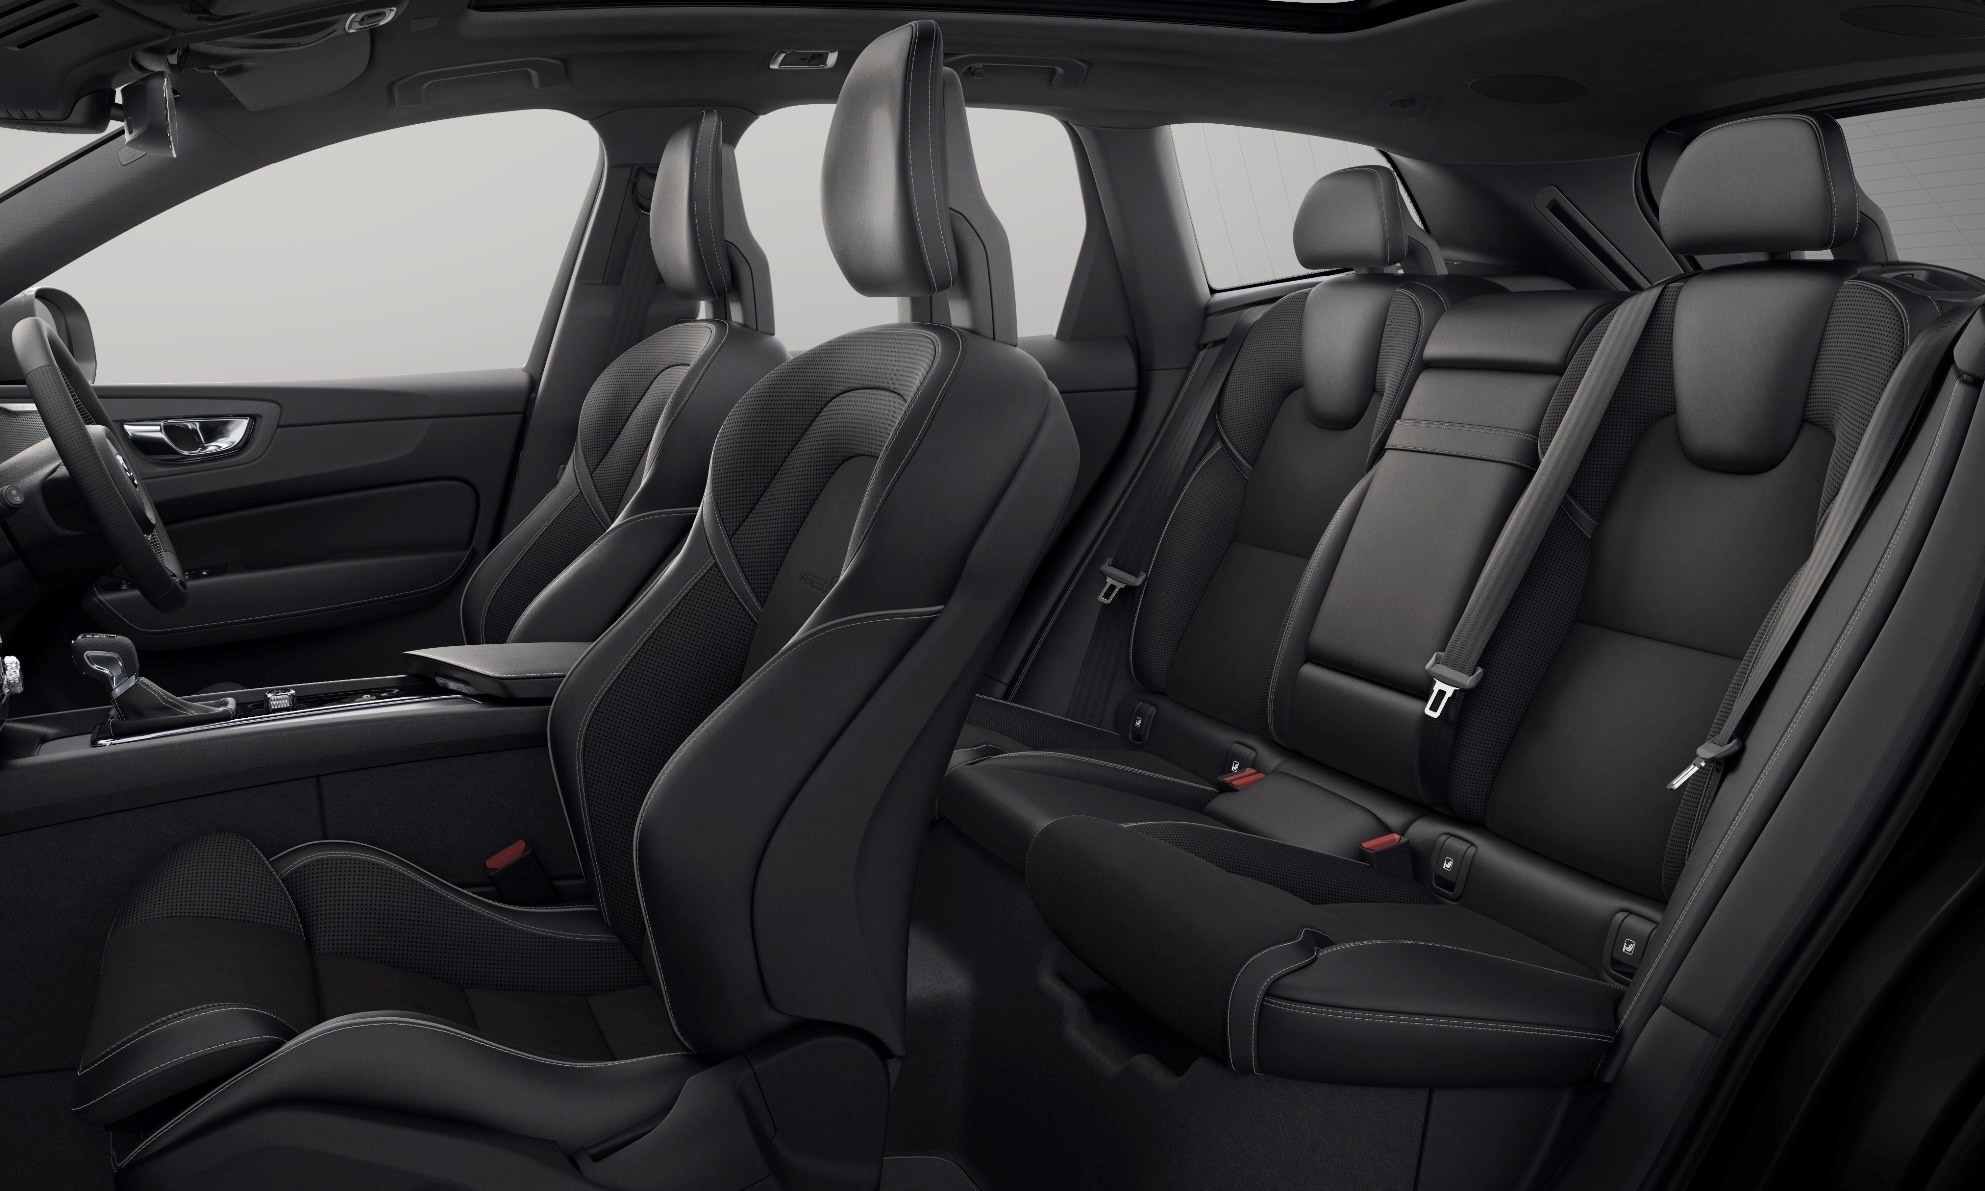 Volvo XC60 cabin